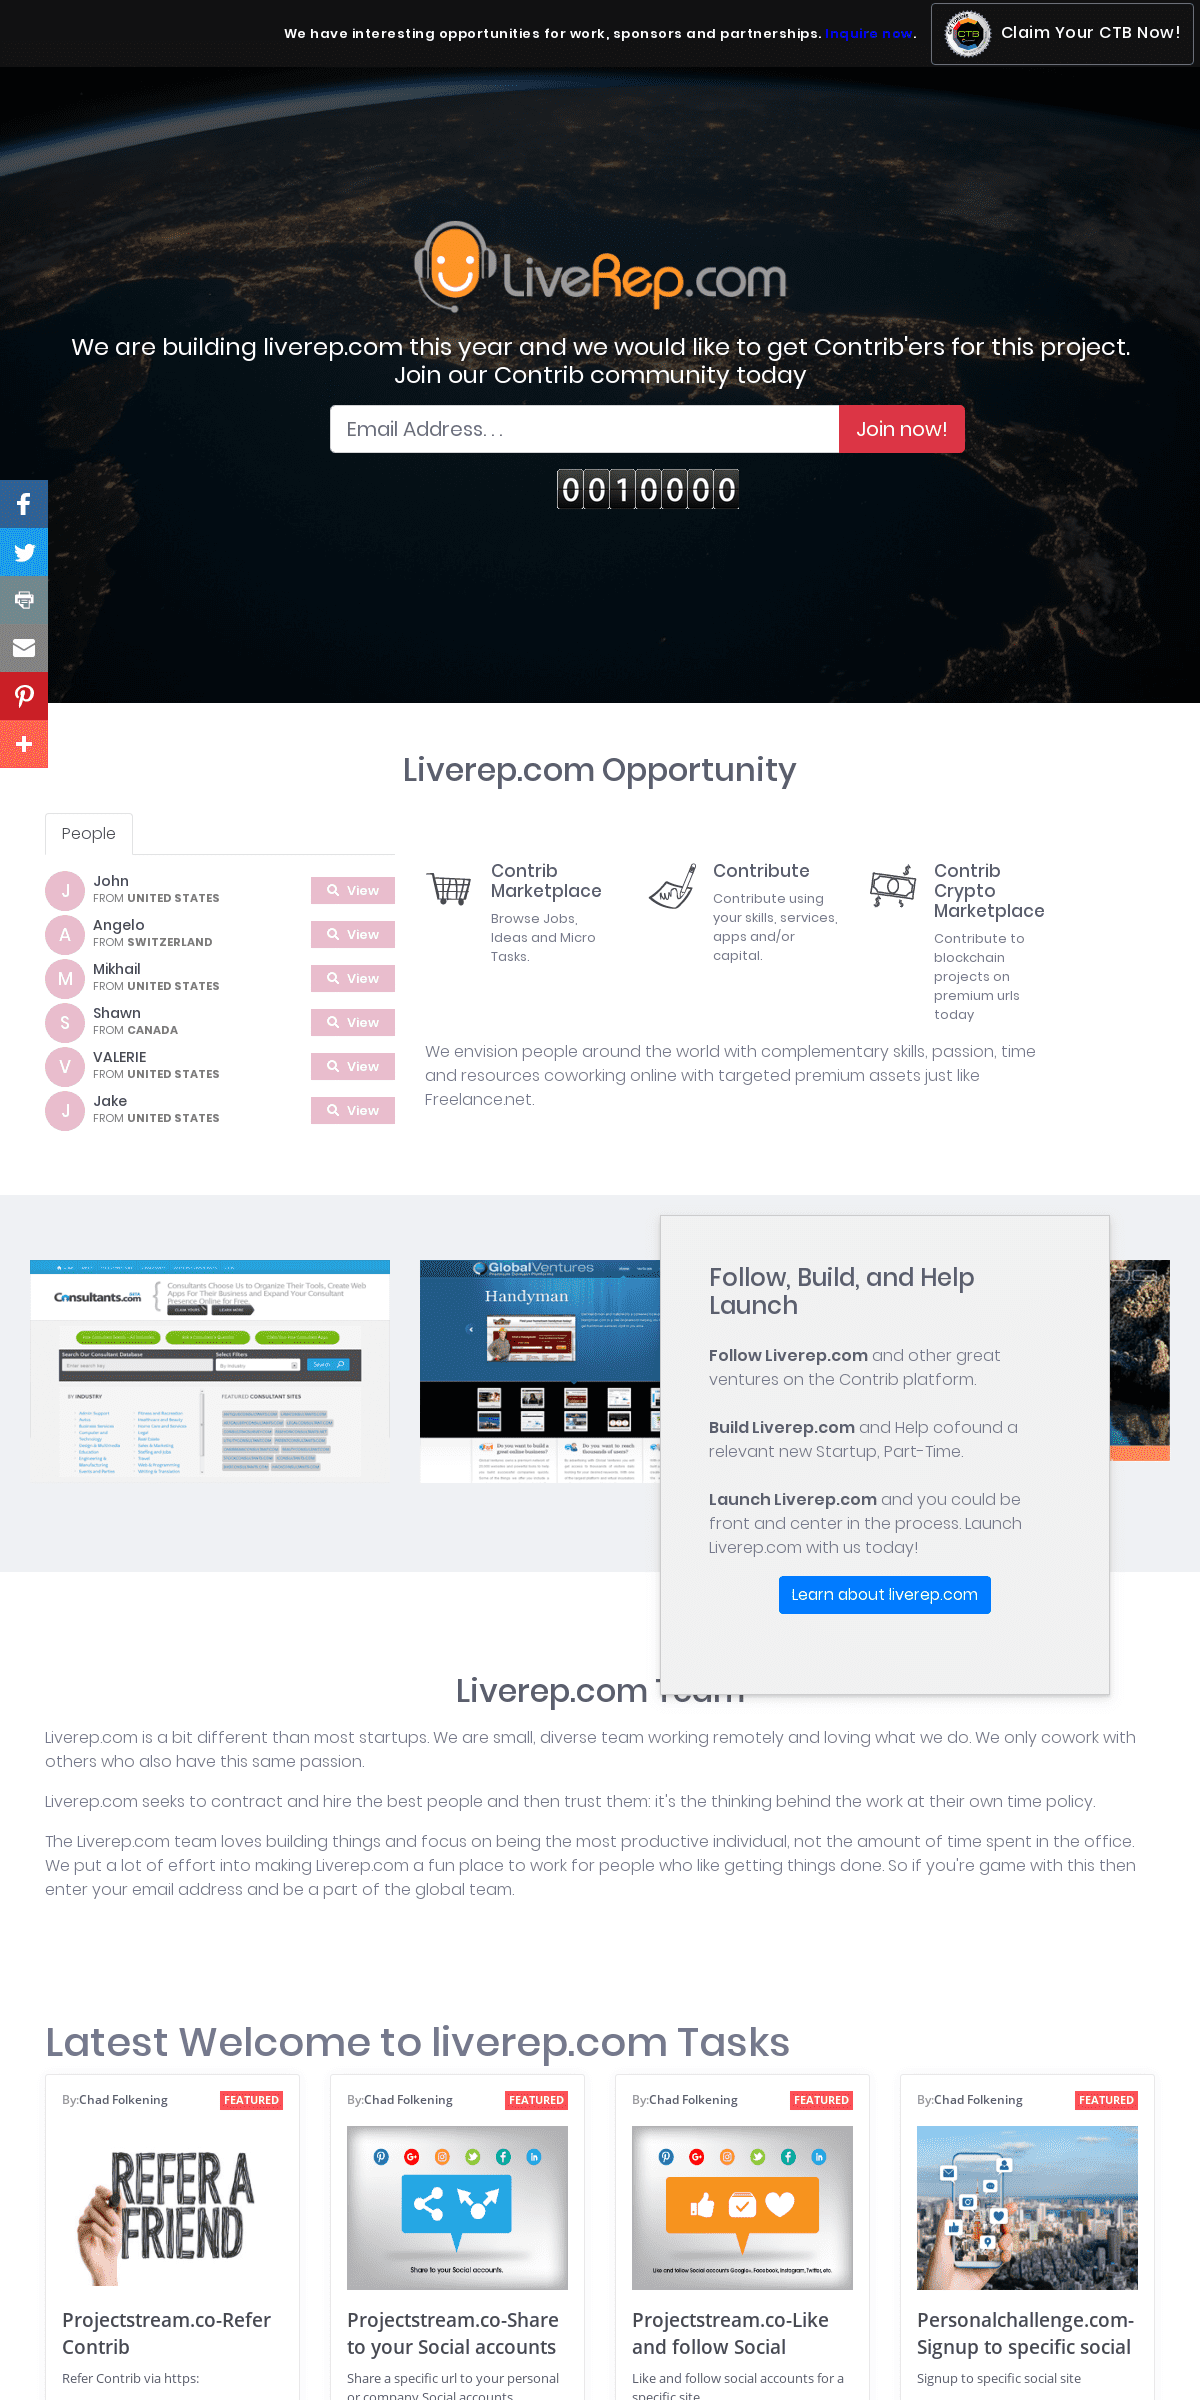 Welcome to liverep.com - Homepage